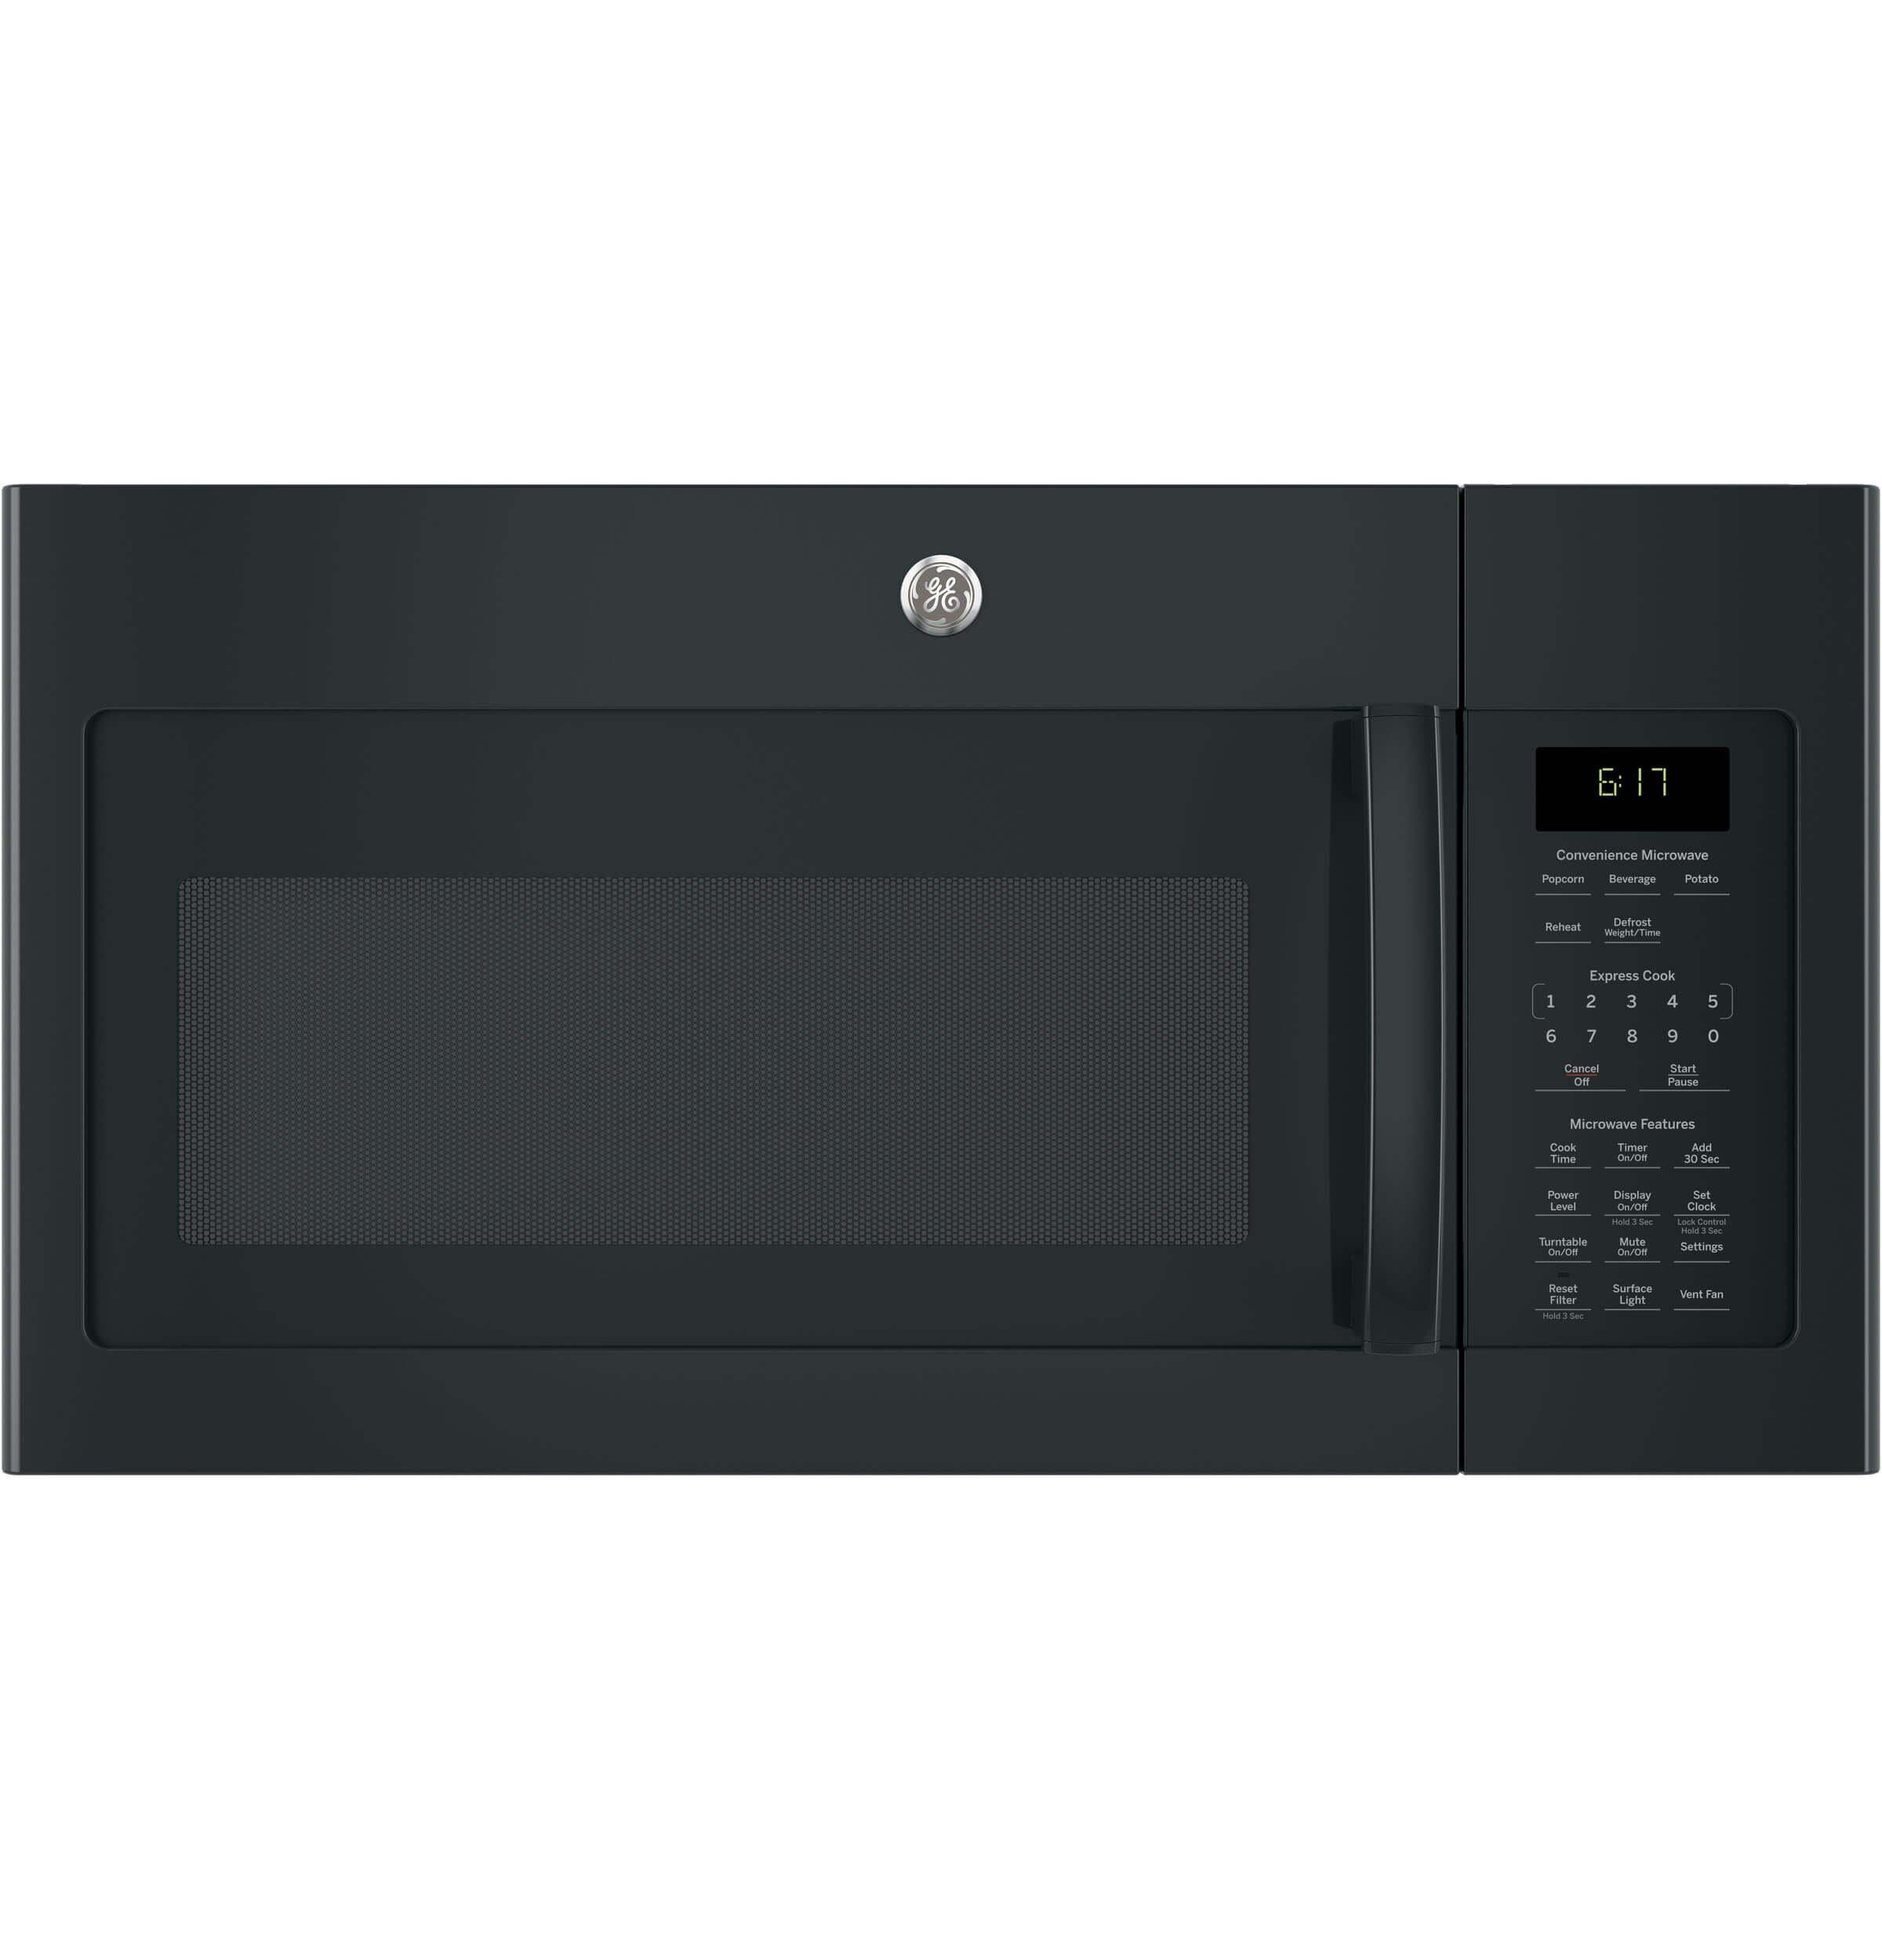 GE JVM6172DKBB Over-the- Over-the-Range Microwave, 1.7, Black by GE (Image #1)